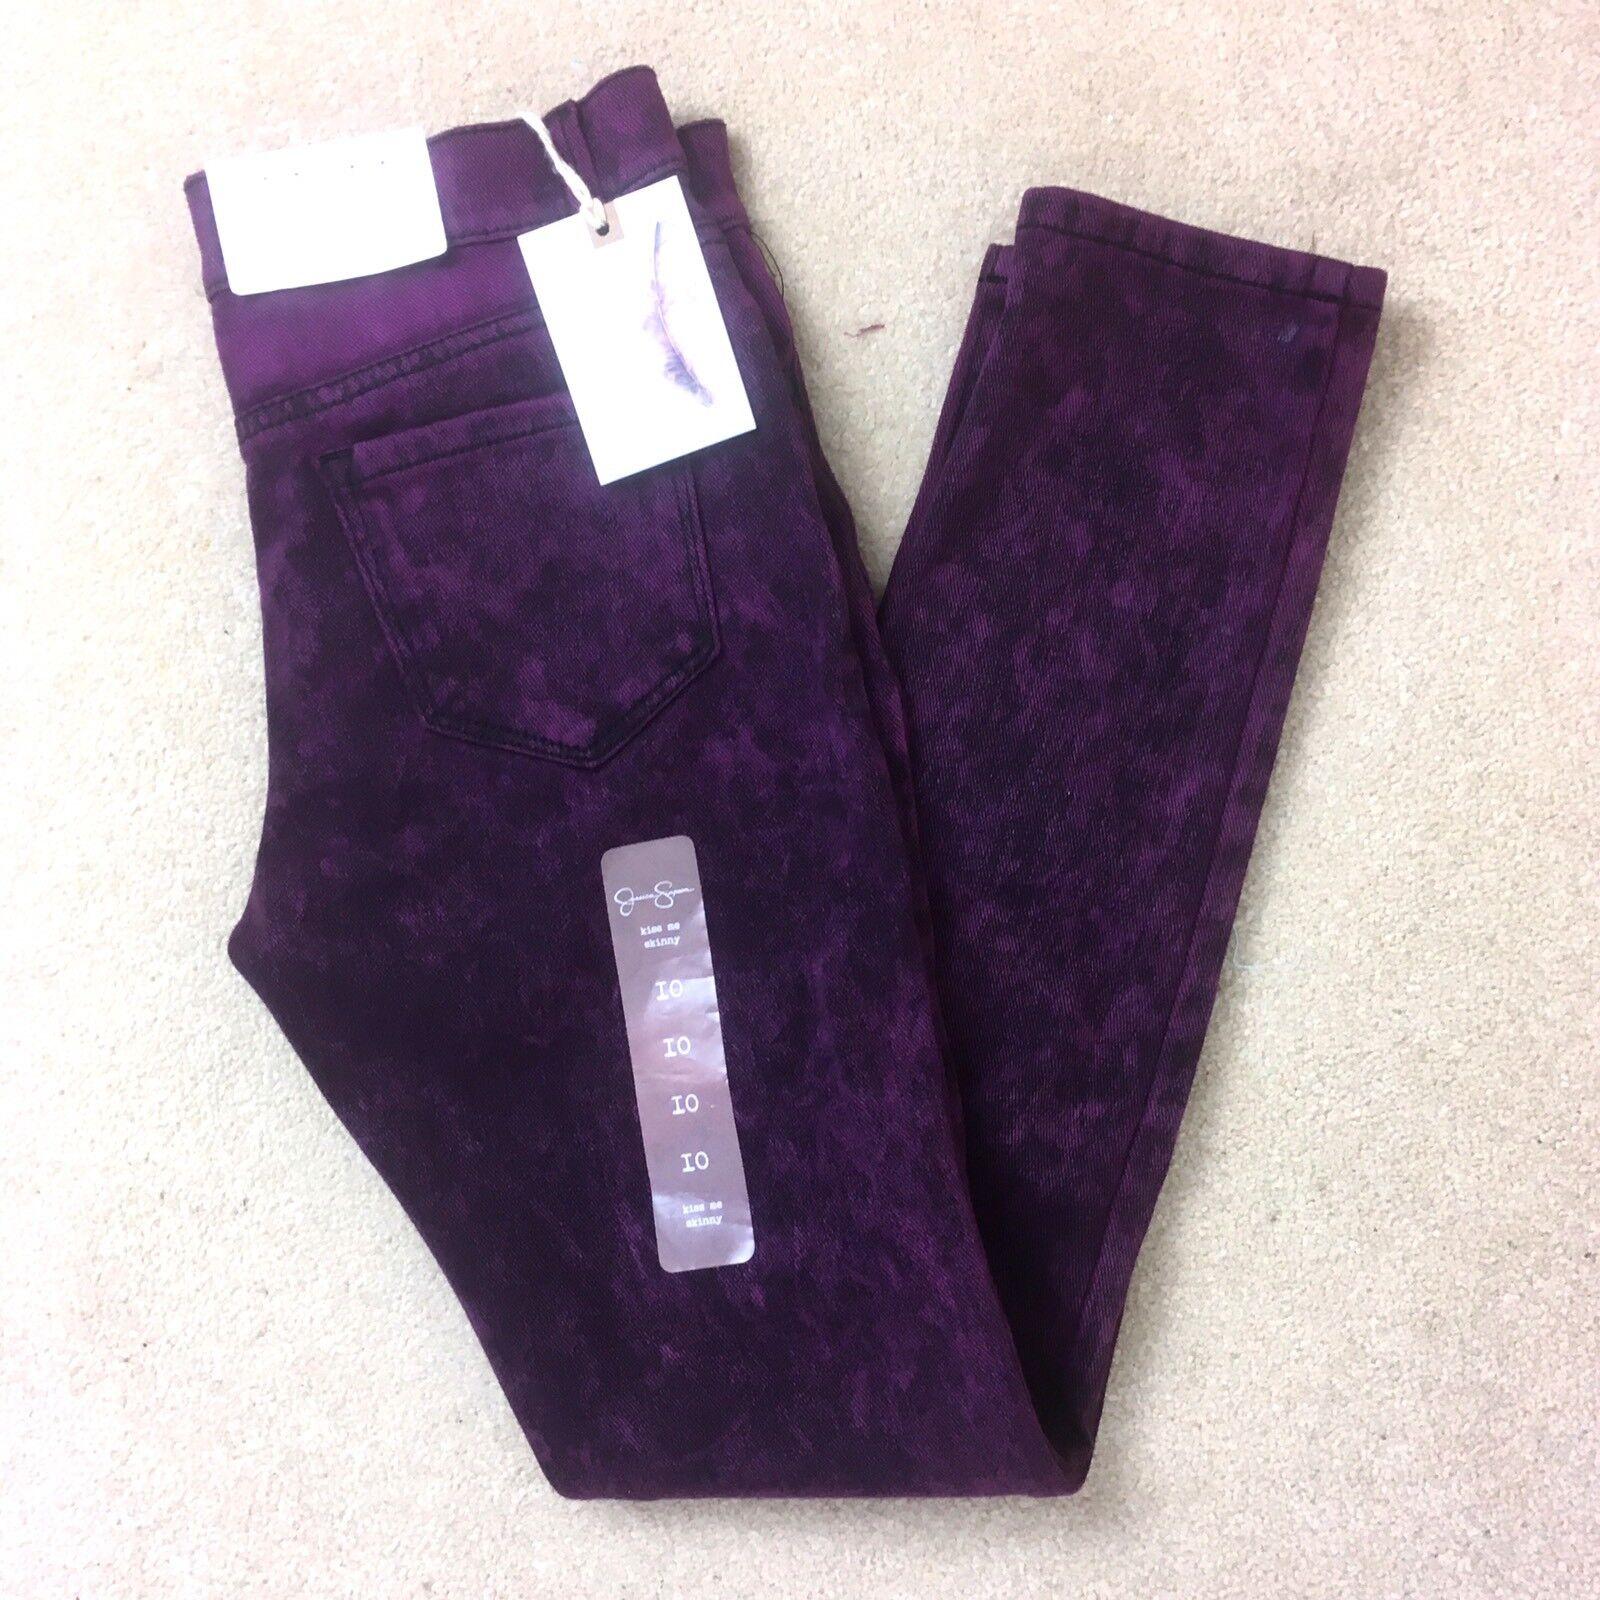 Jessica Simpson Jeans Jeggings Stretch Purple Kiss Me Skinny  Size  10 R